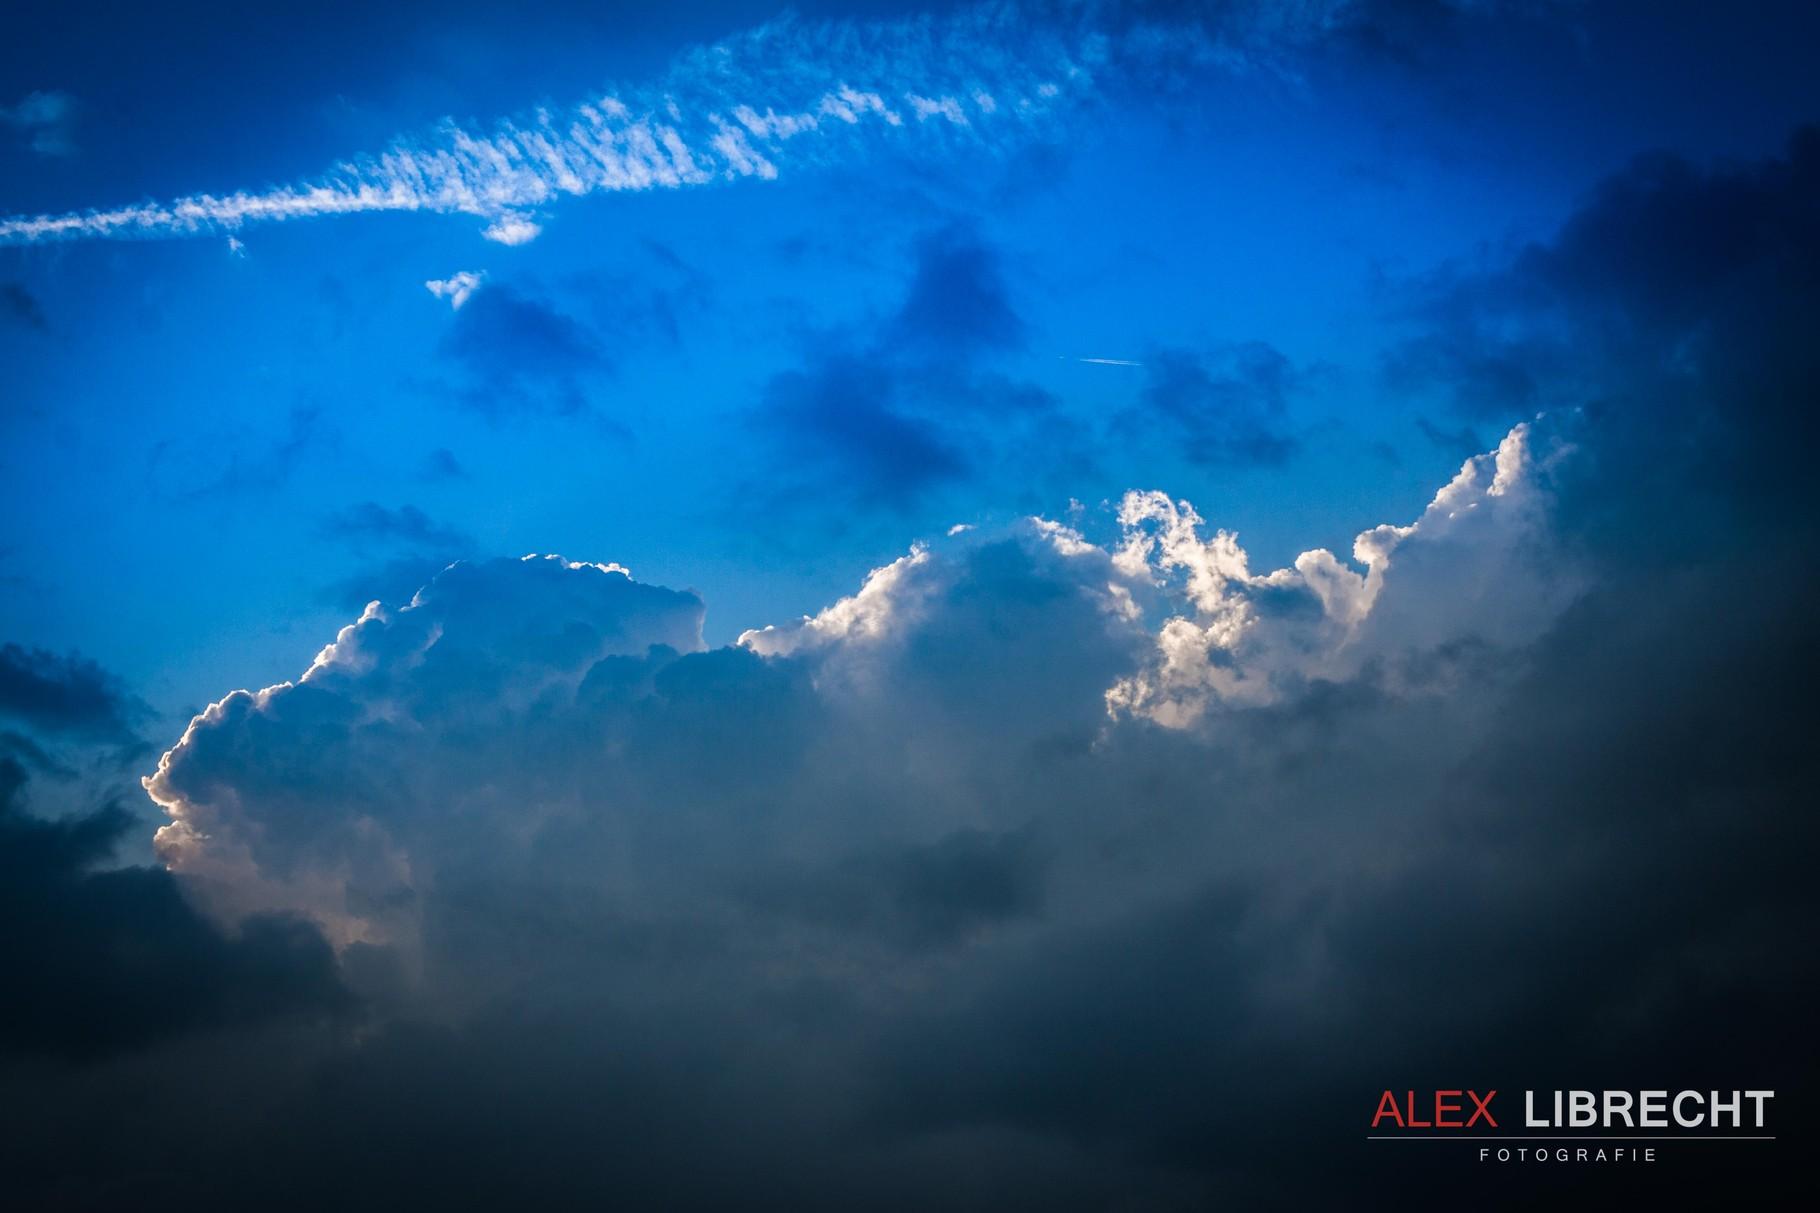 Altenoythe_Friesoythe_fotograf_friesoythe